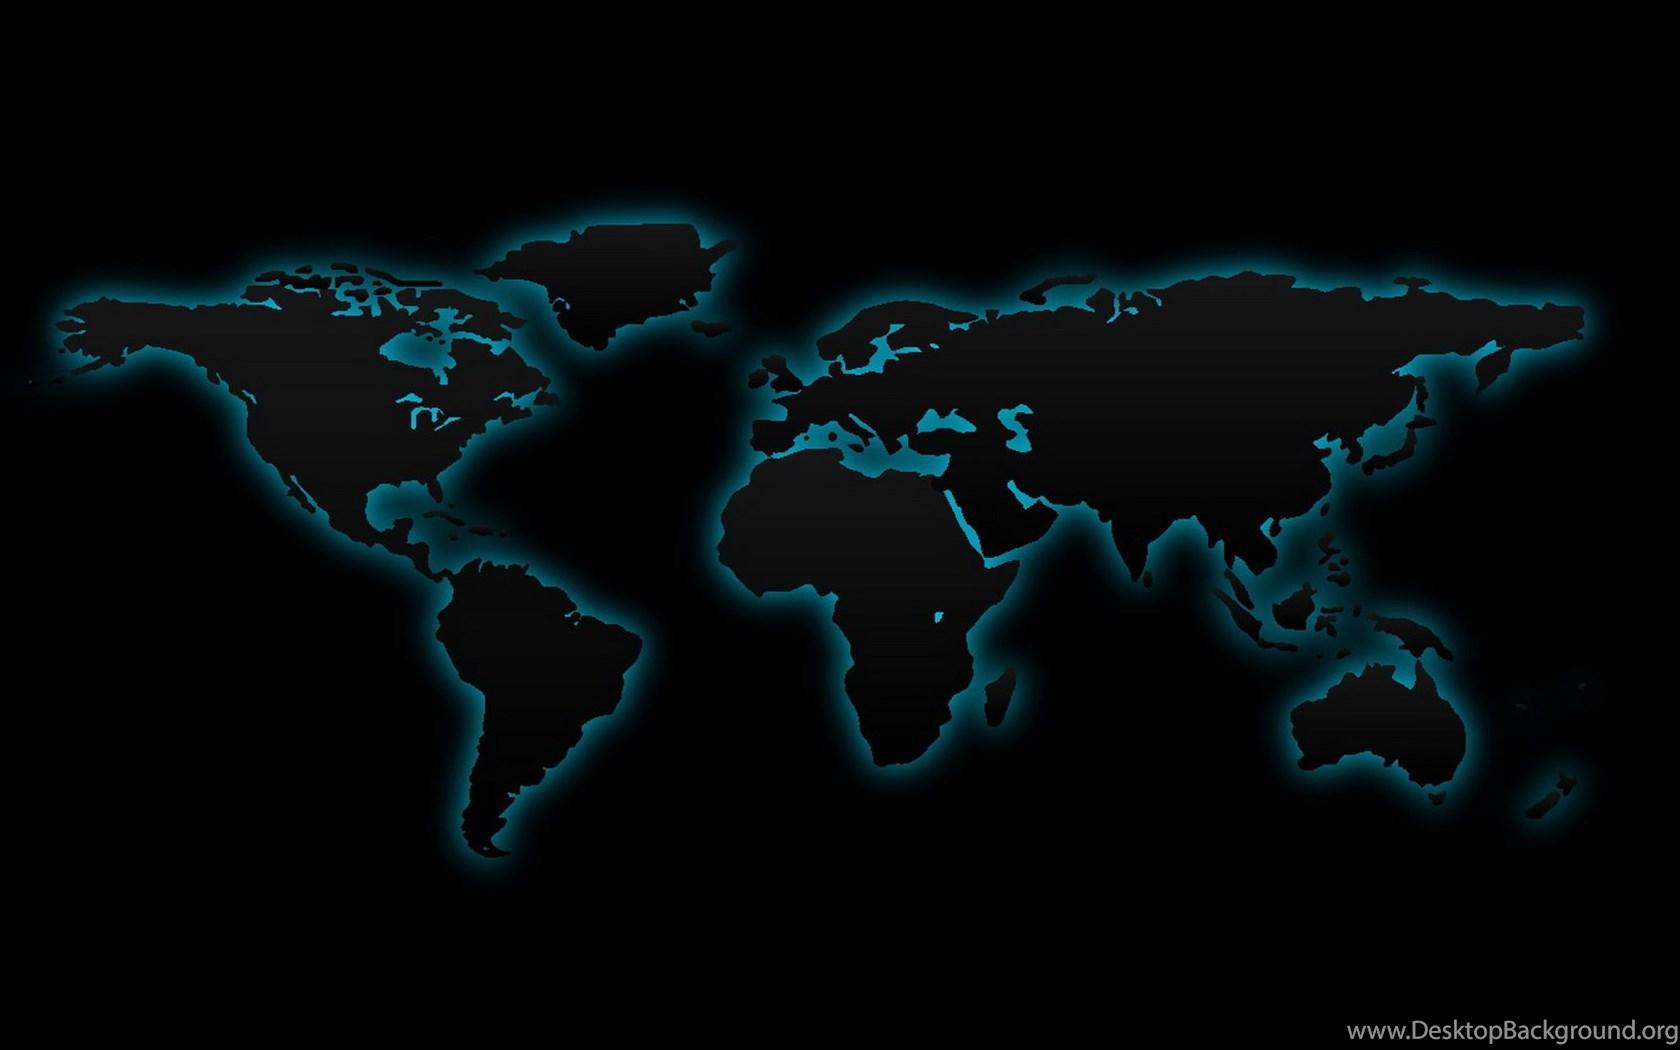 Pin digital world map hd wallpapers 05 on pinterest desktop background widescreen gumiabroncs Images